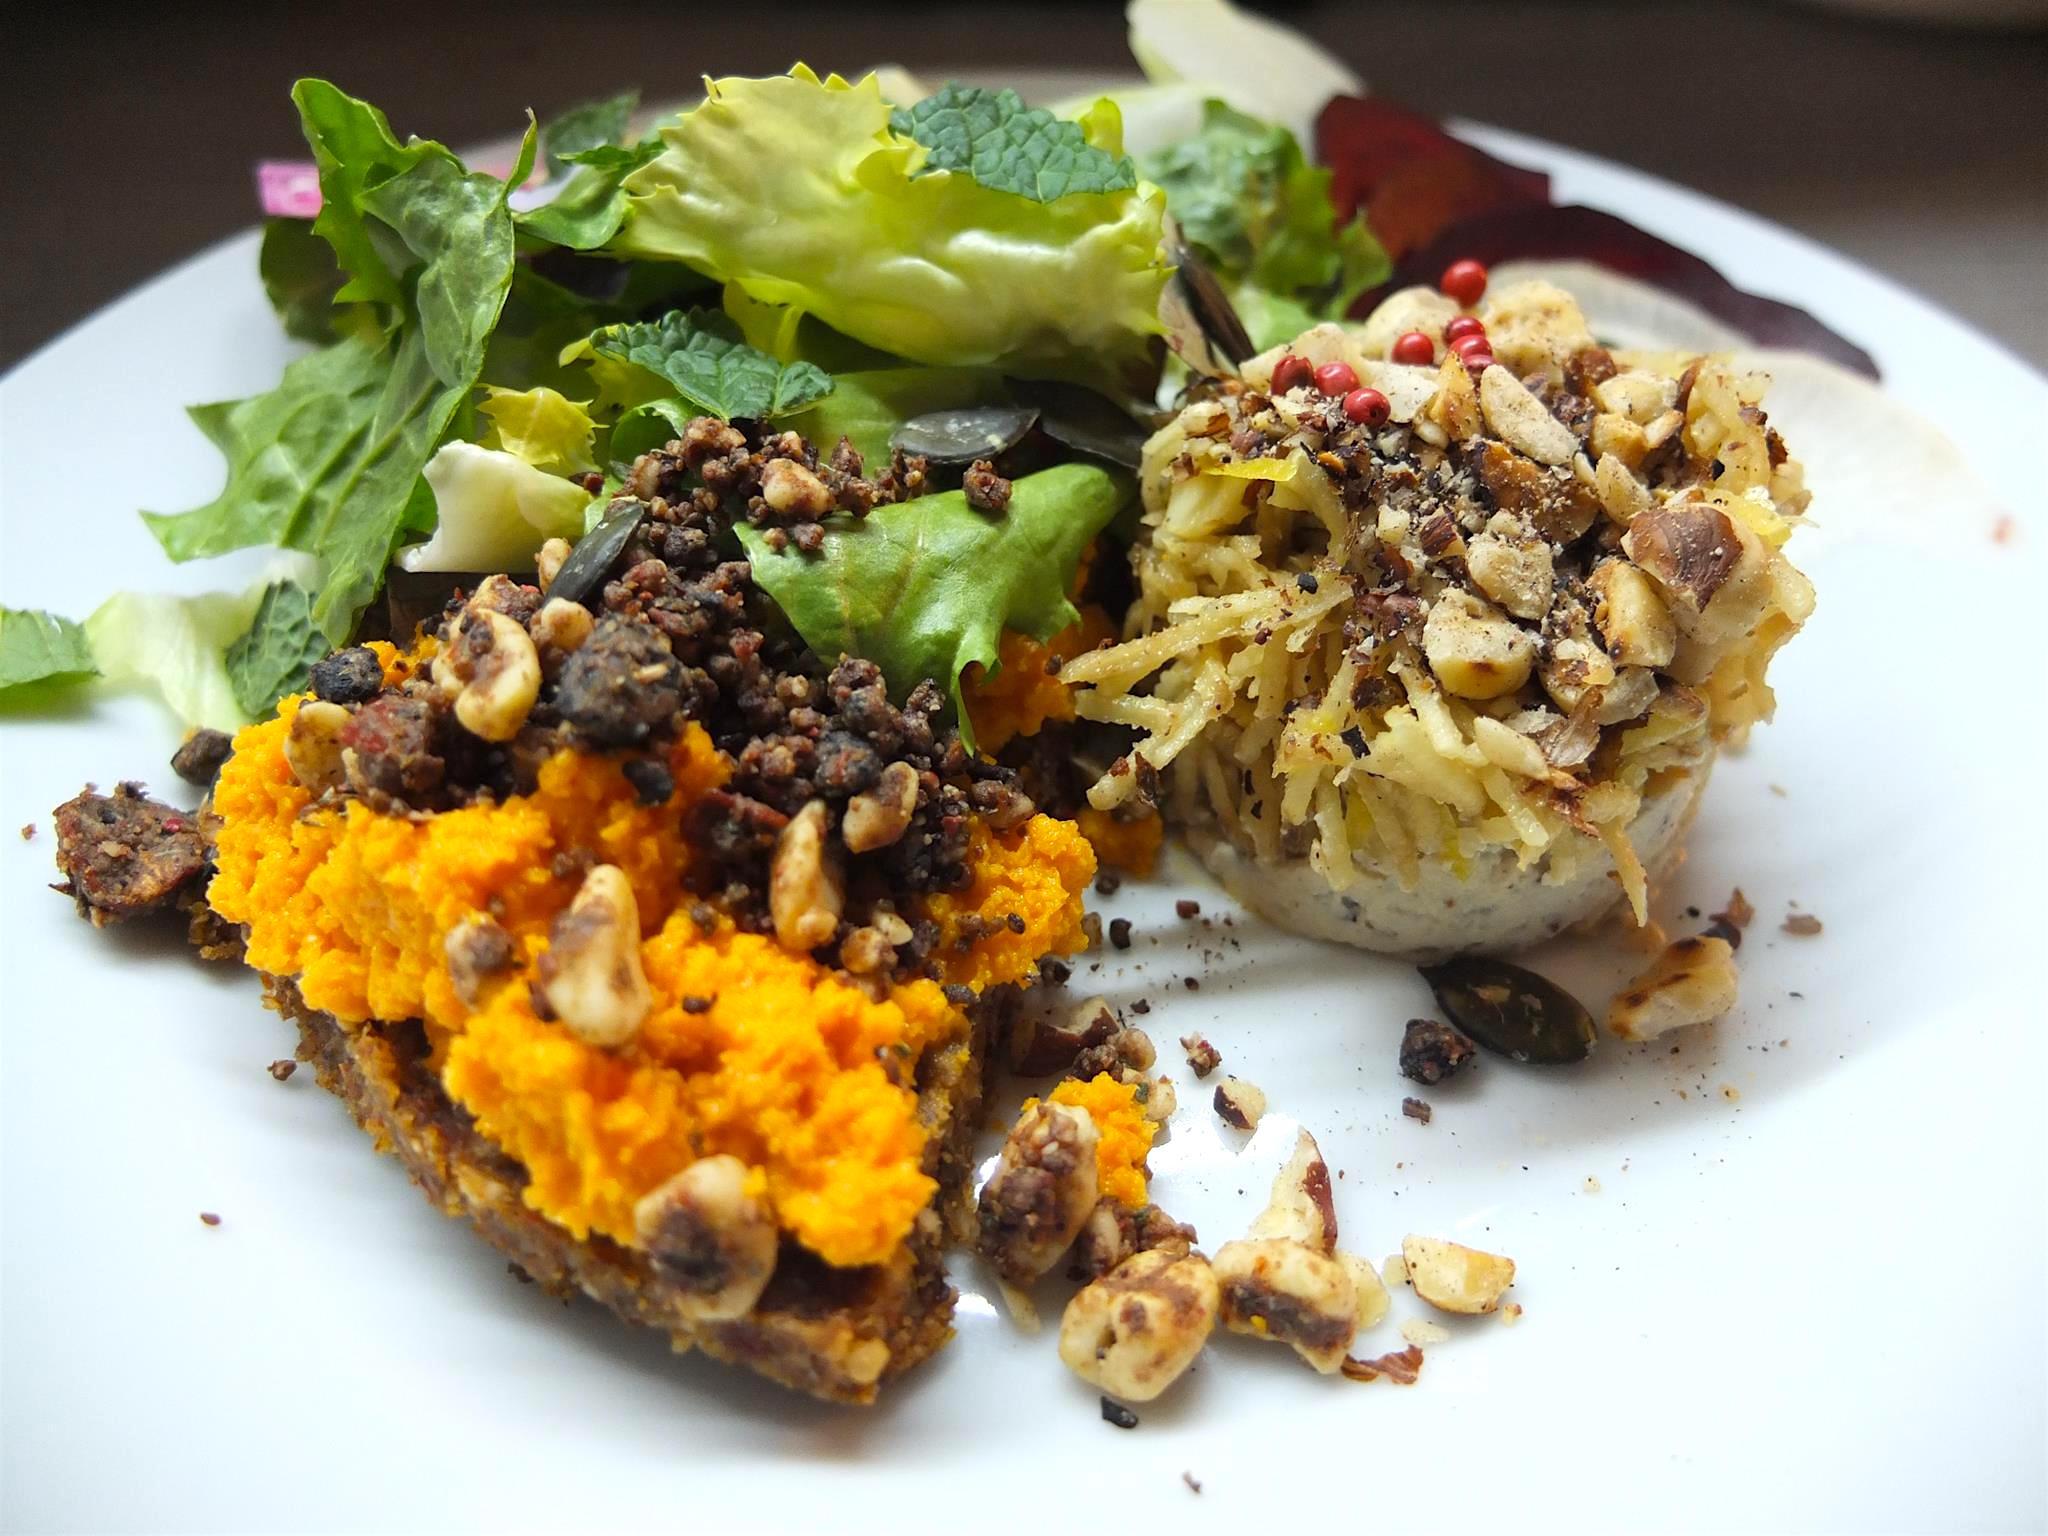 lyon-food-healthy-vegan-green-gluten